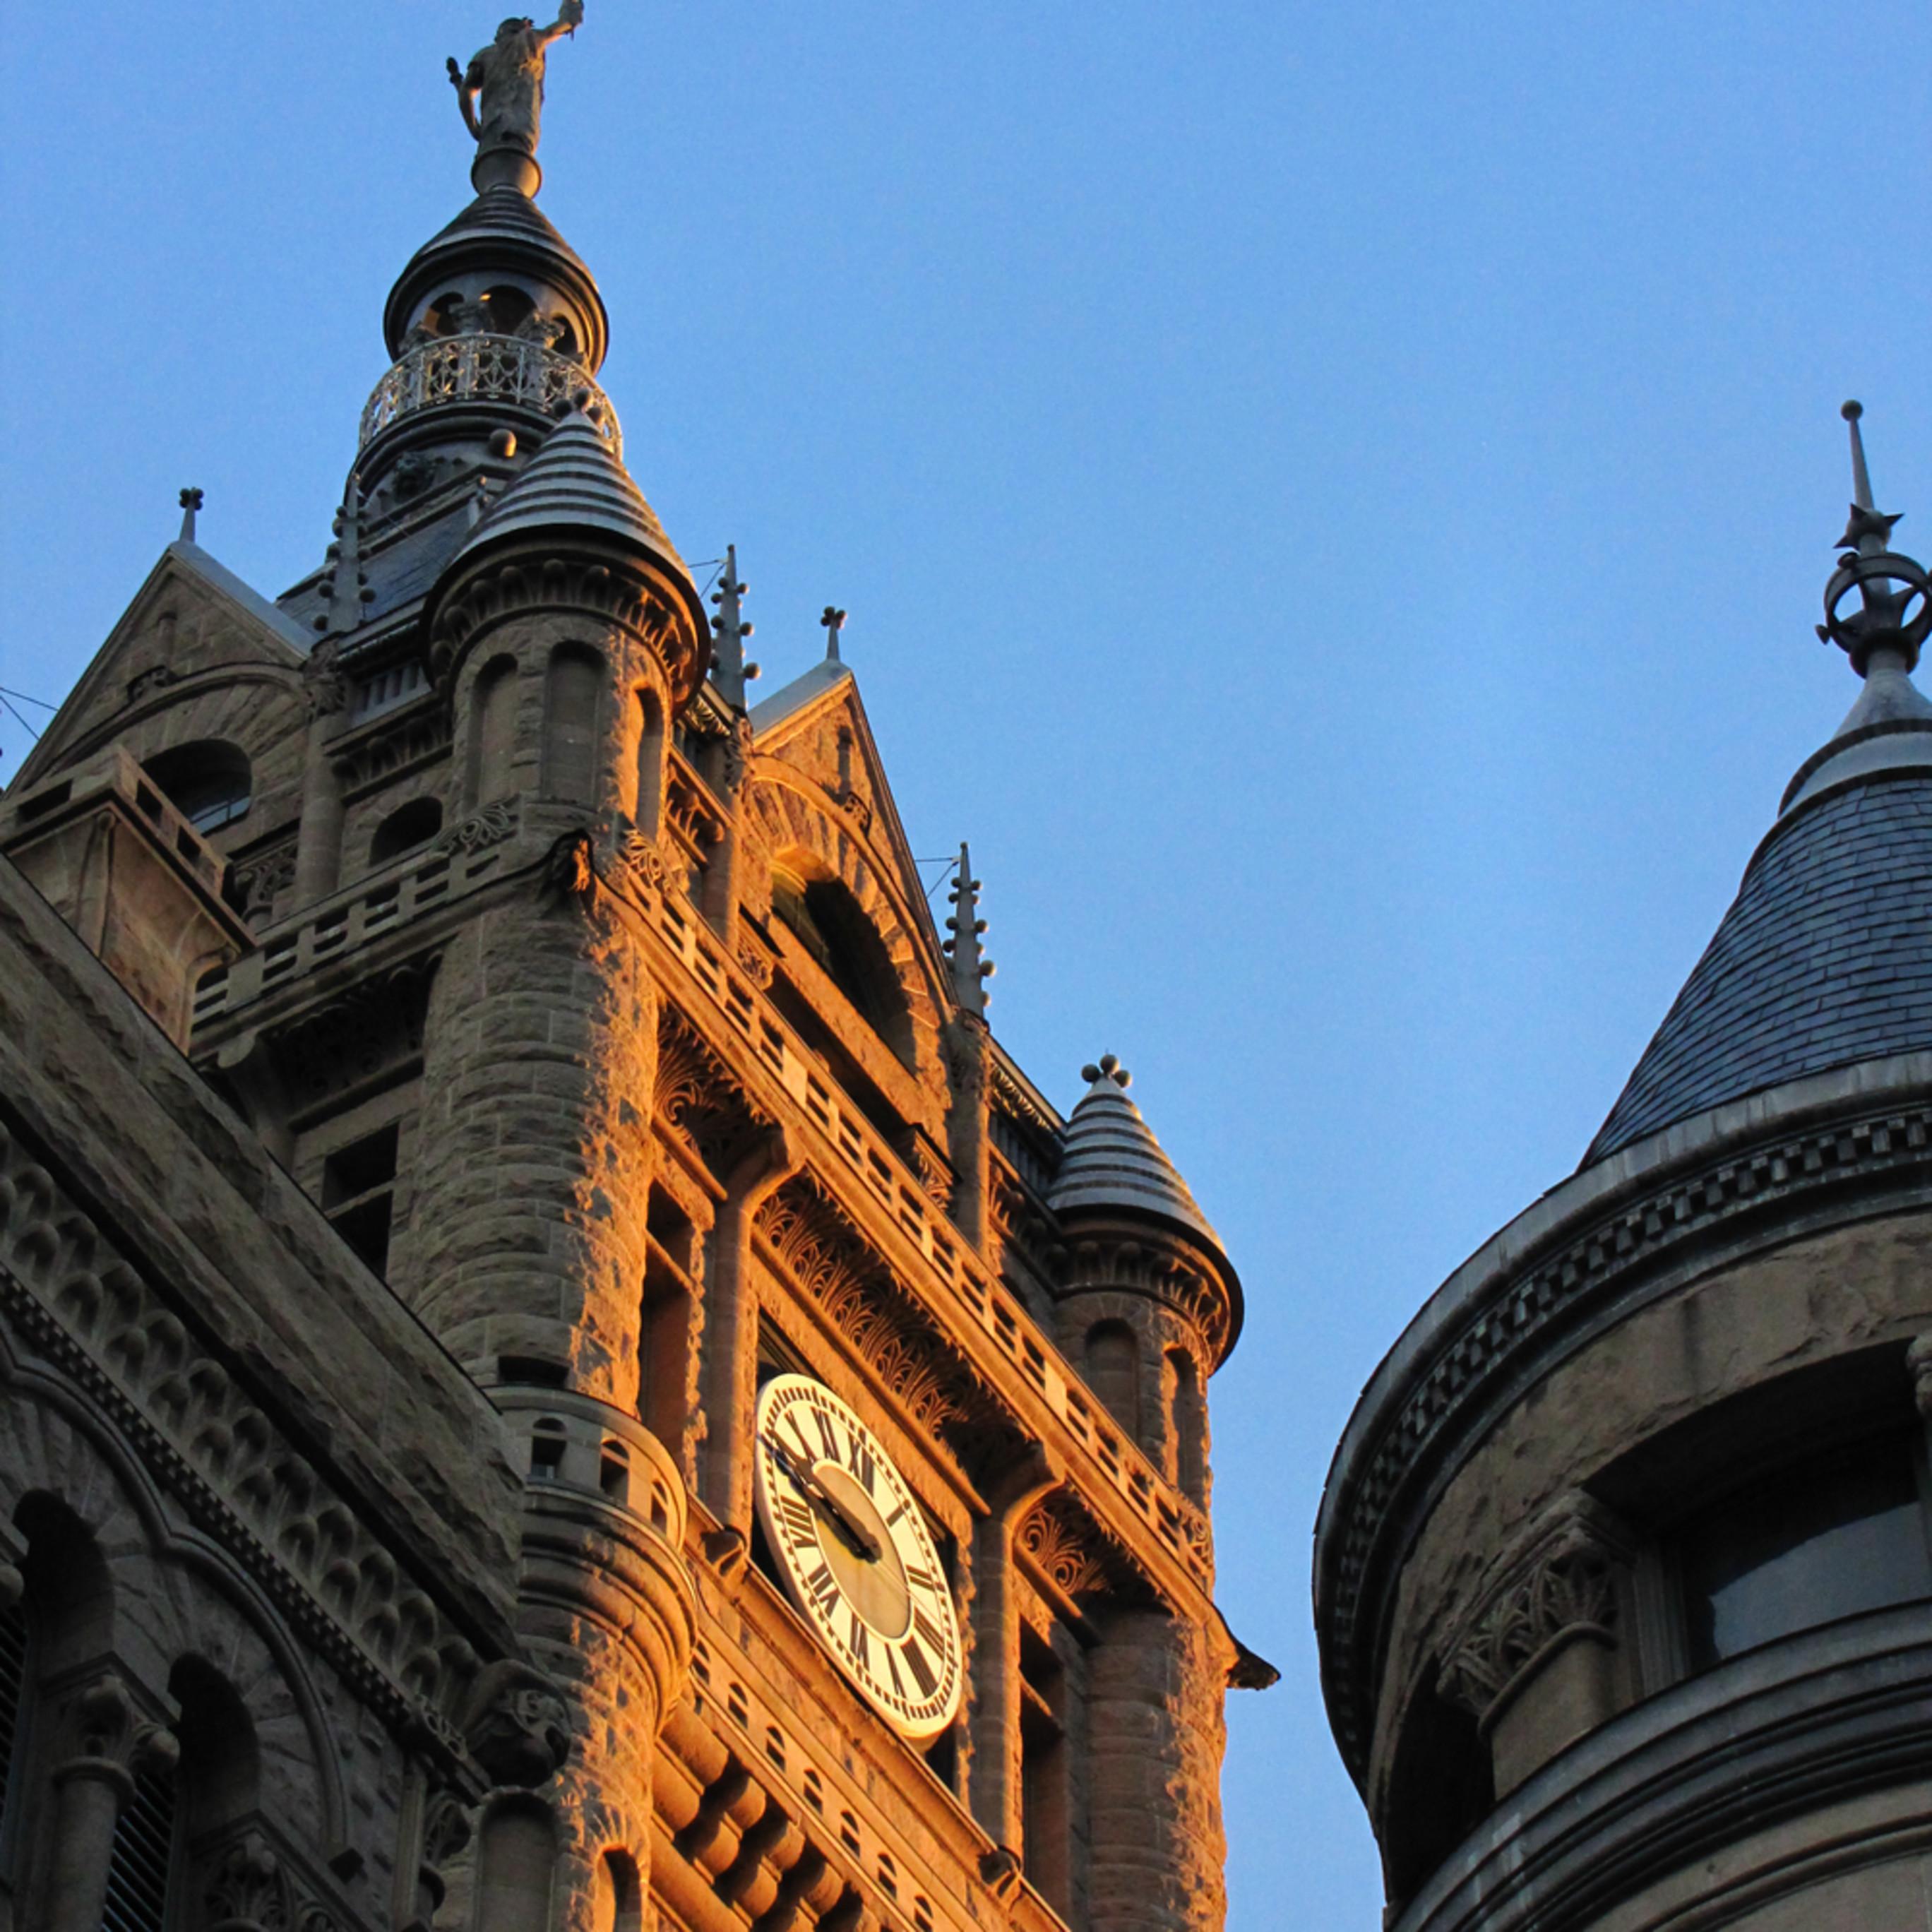 City hall at sunset x6ugyc